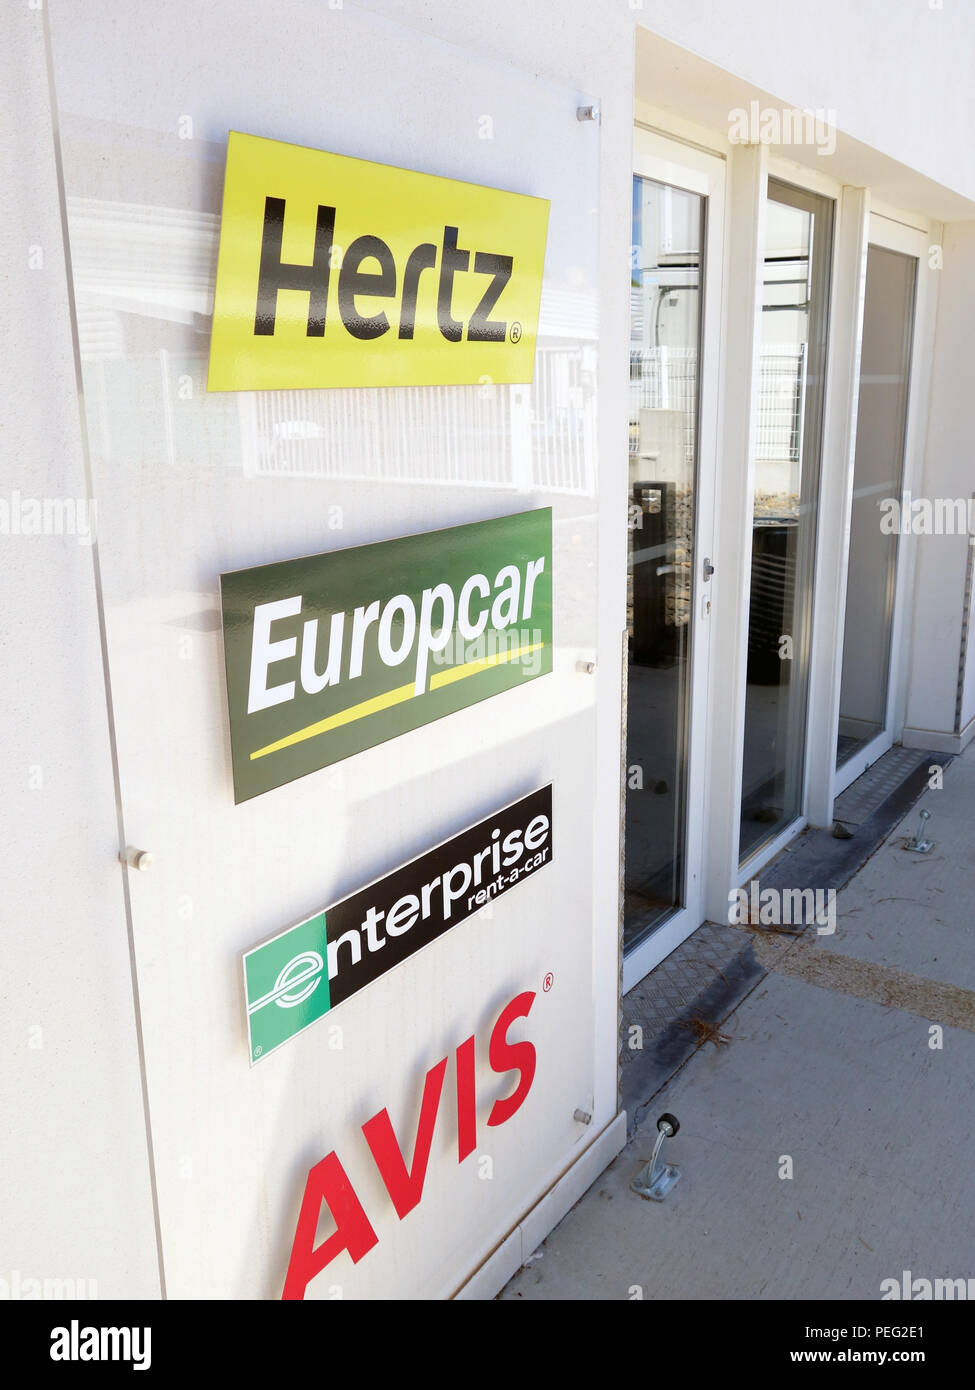 Hertz Rental Stock Photos Amp Hertz Rental Stock Images Alamy